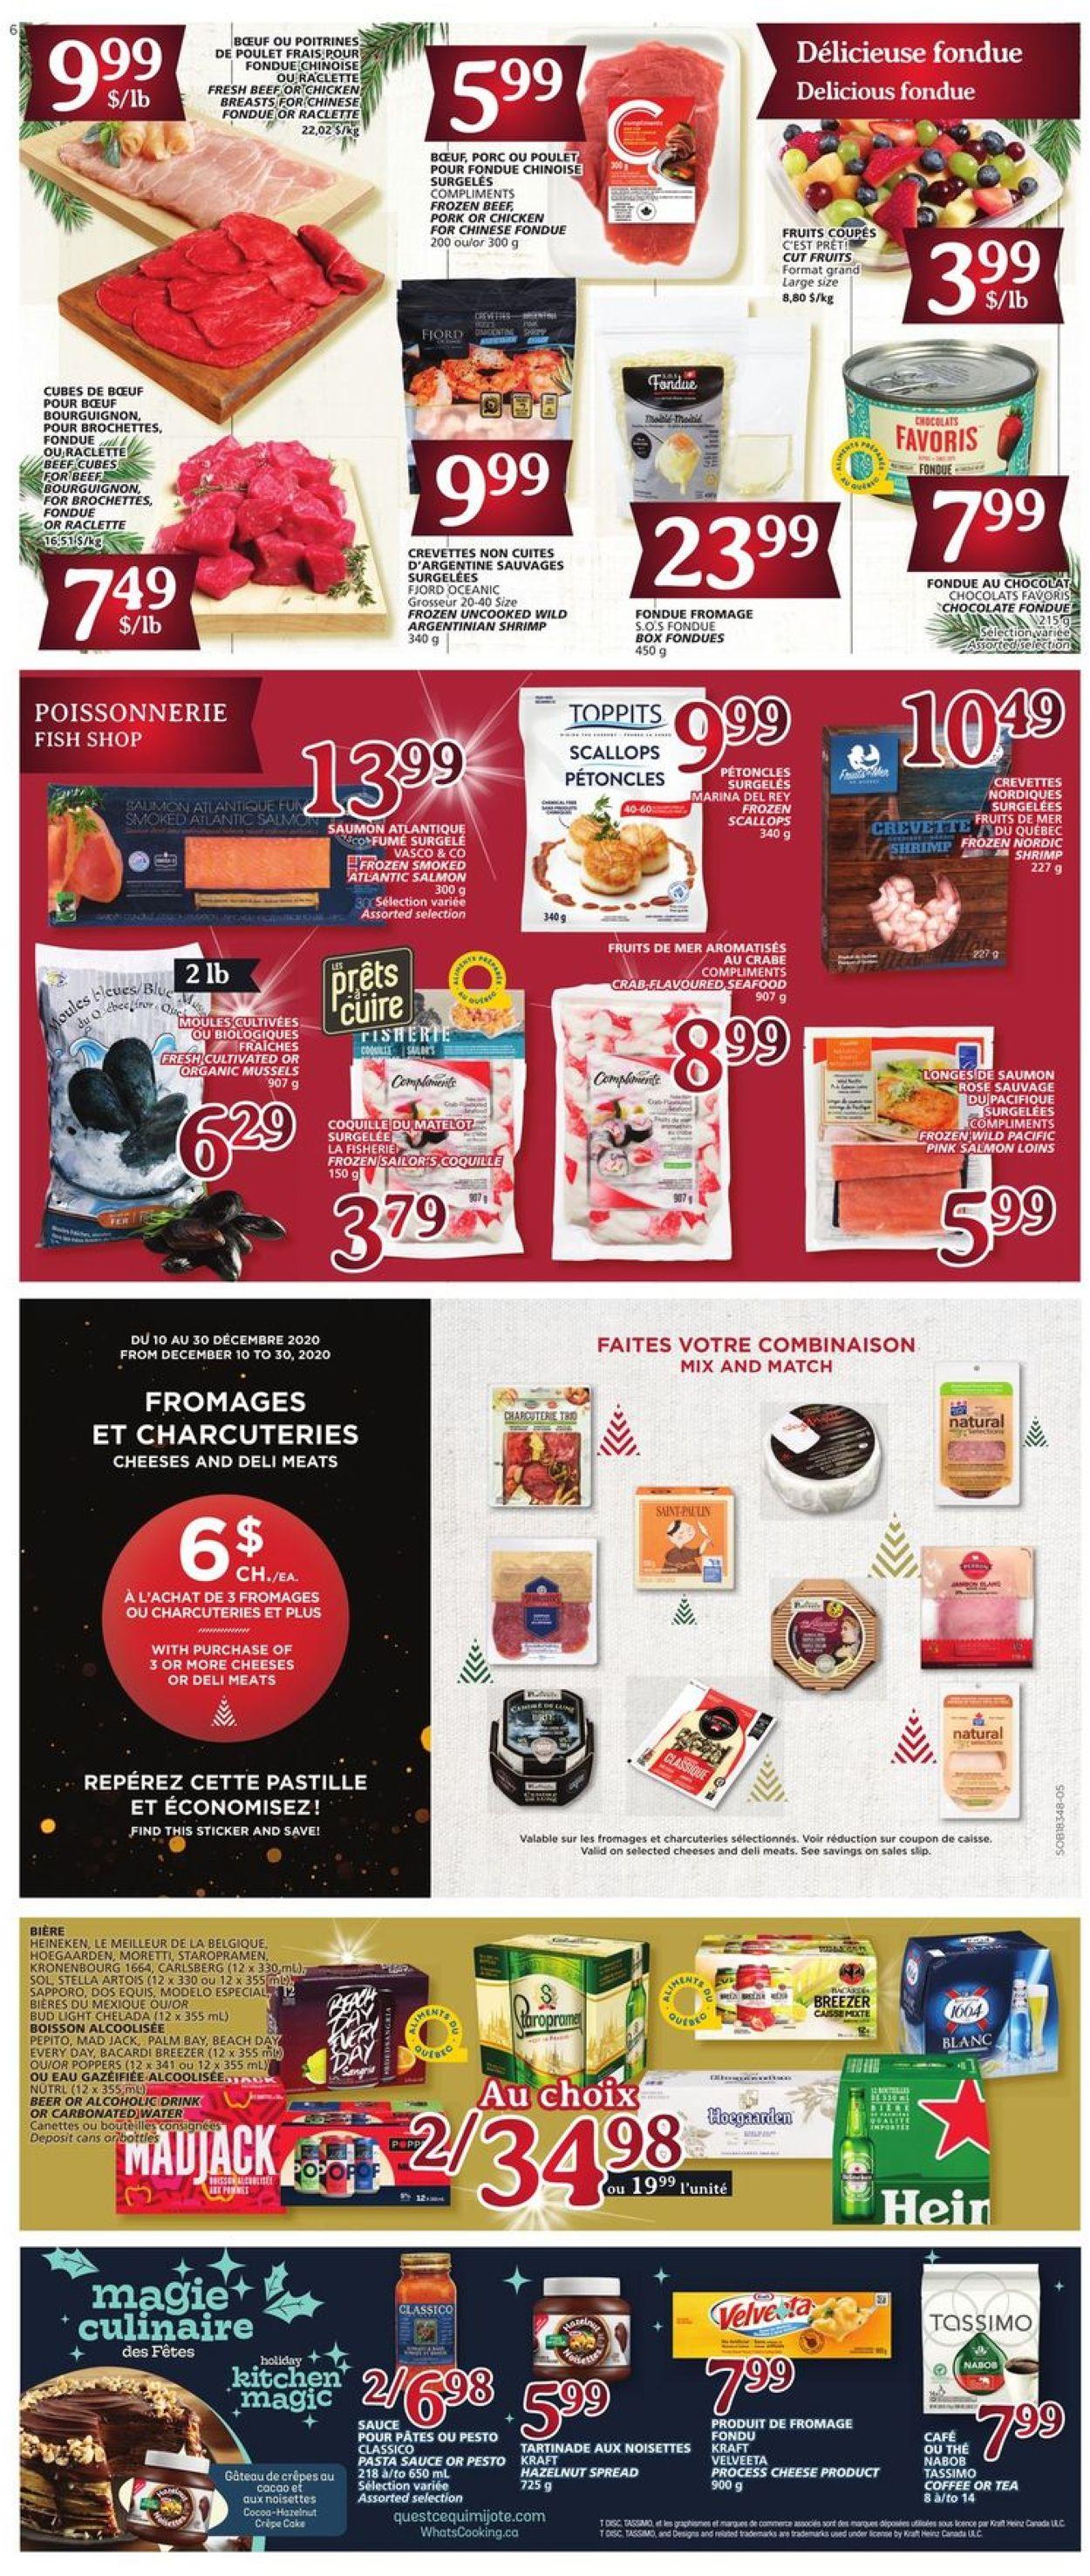 IGA - Christmas 2020 - Iles-de-la-Madeleine Flyer - 12/24-12/30/2020 (Page 6)